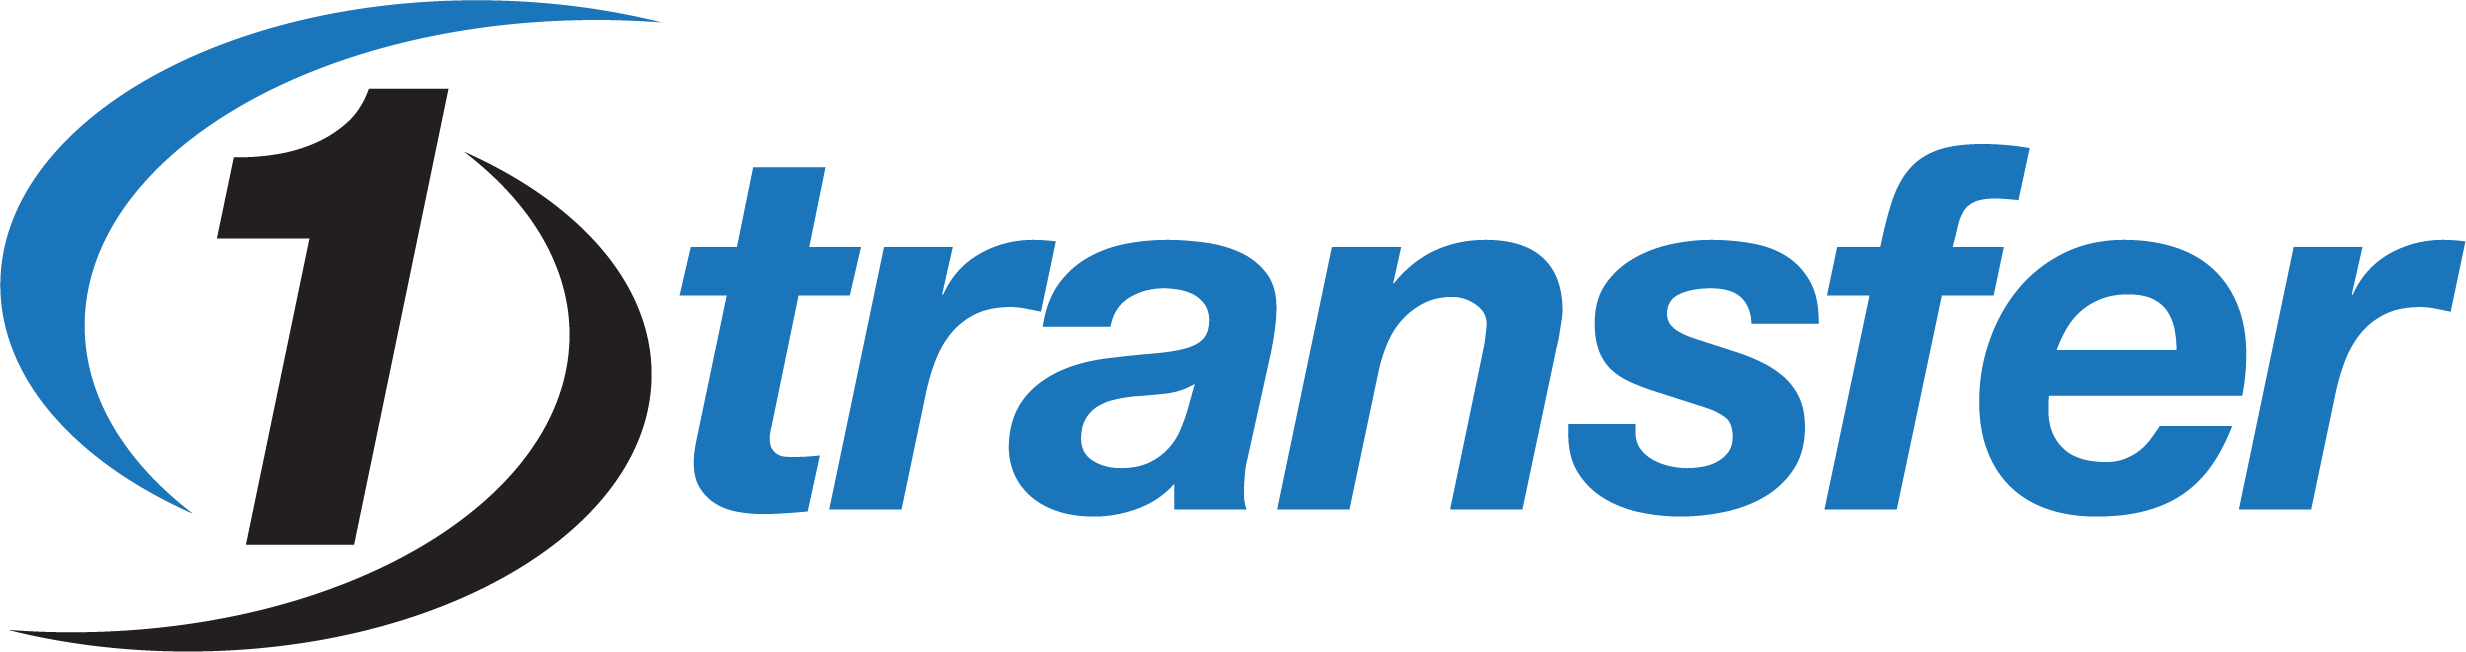 1transfer logo